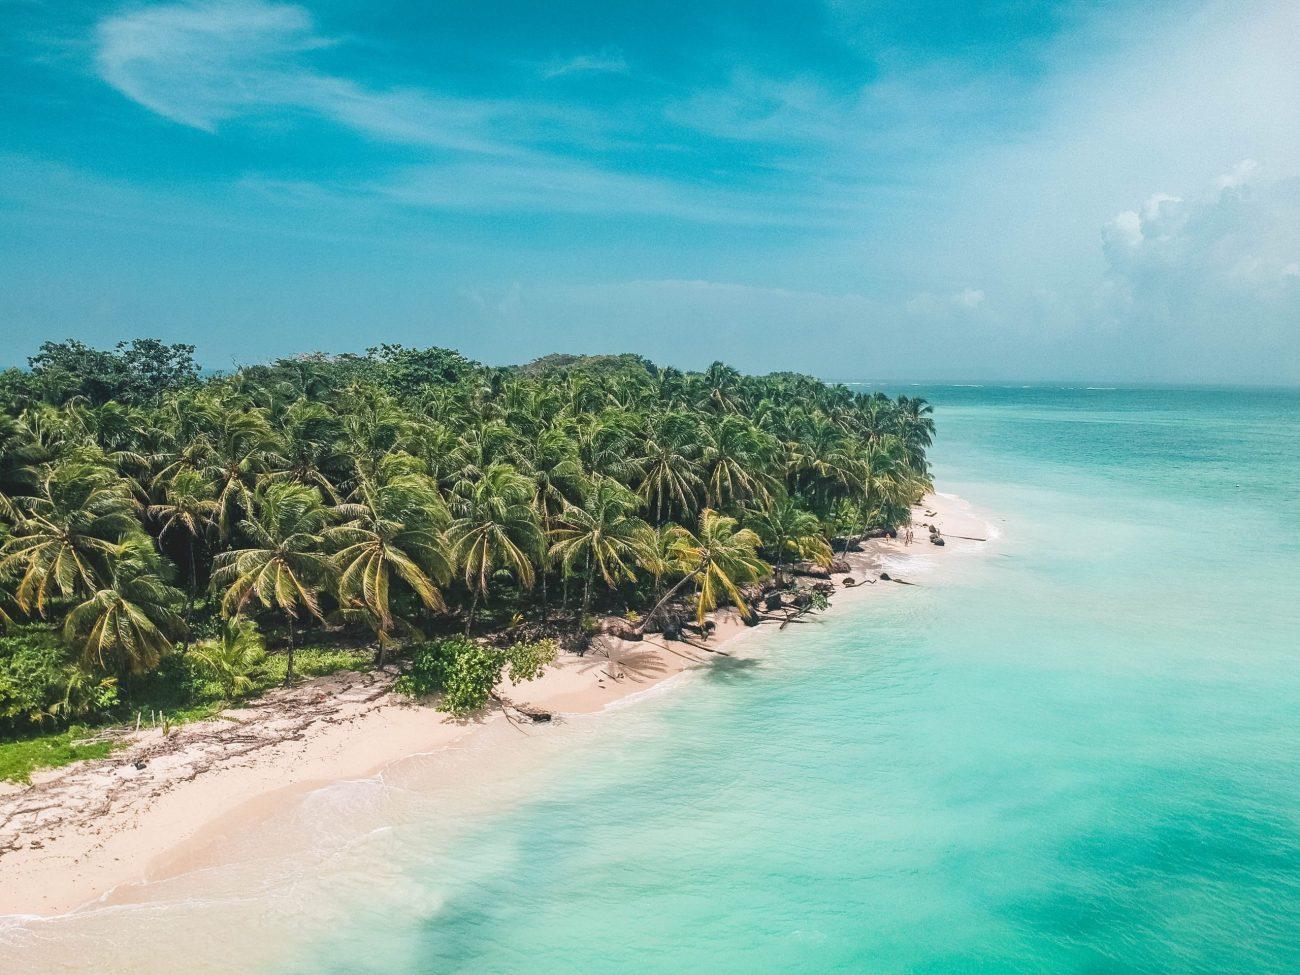 Ostrovy San Blas